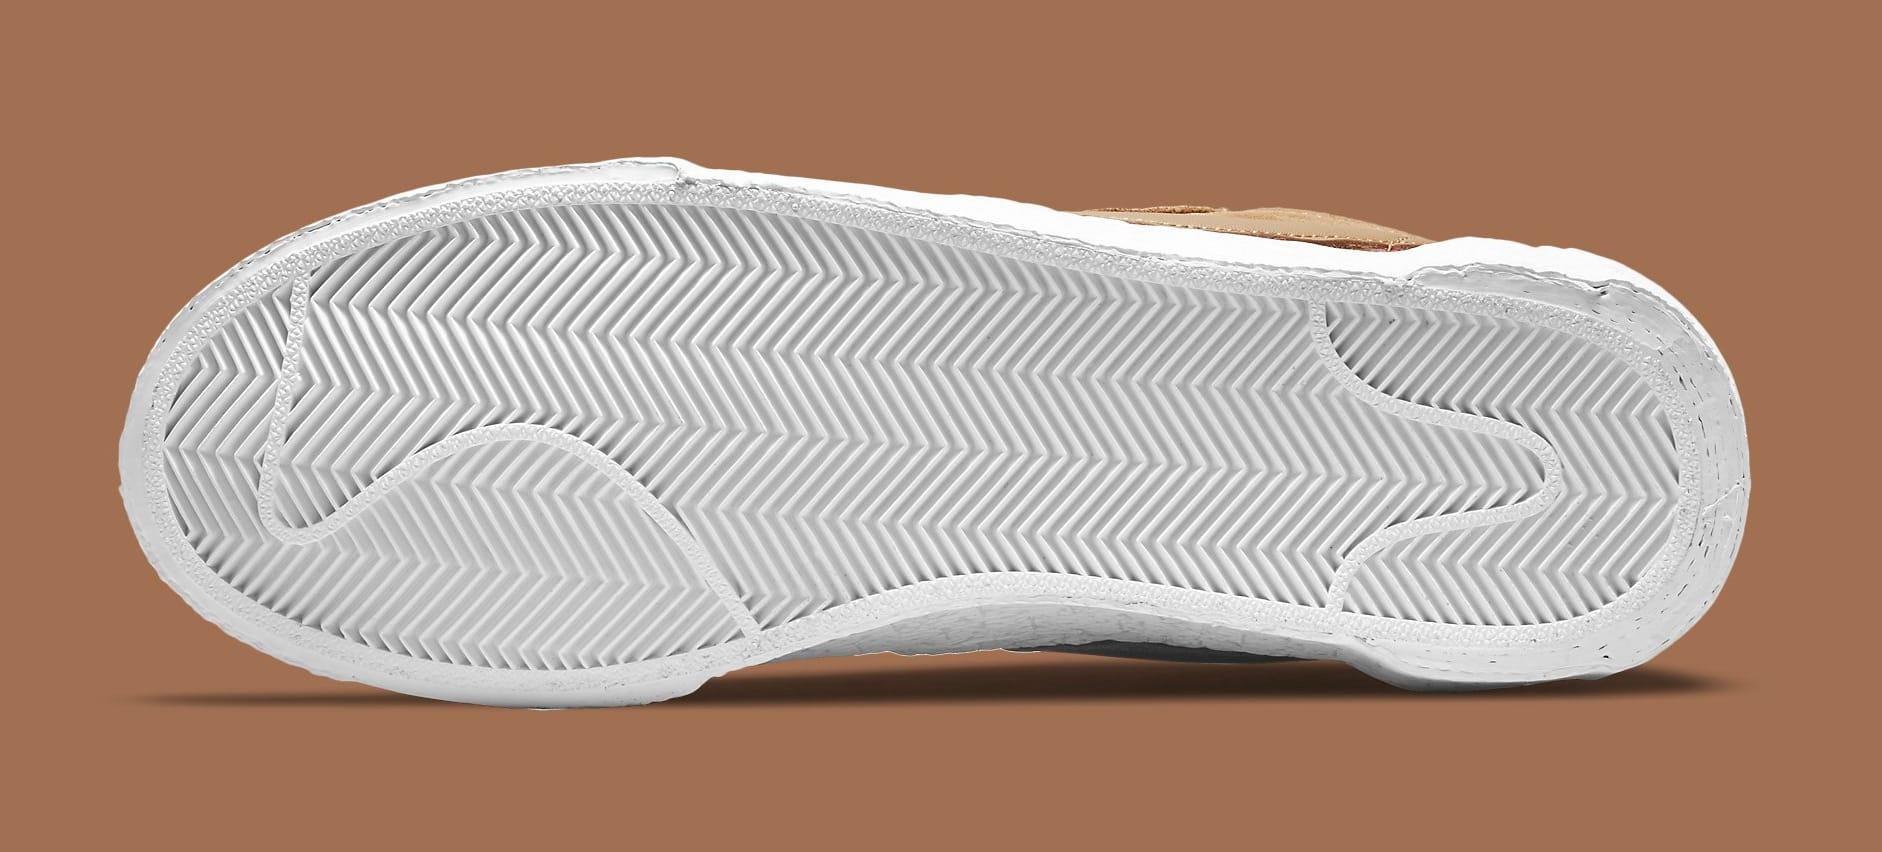 Sacai x Nike Blazer Low 'British Tan' DD1877-200 Outsole